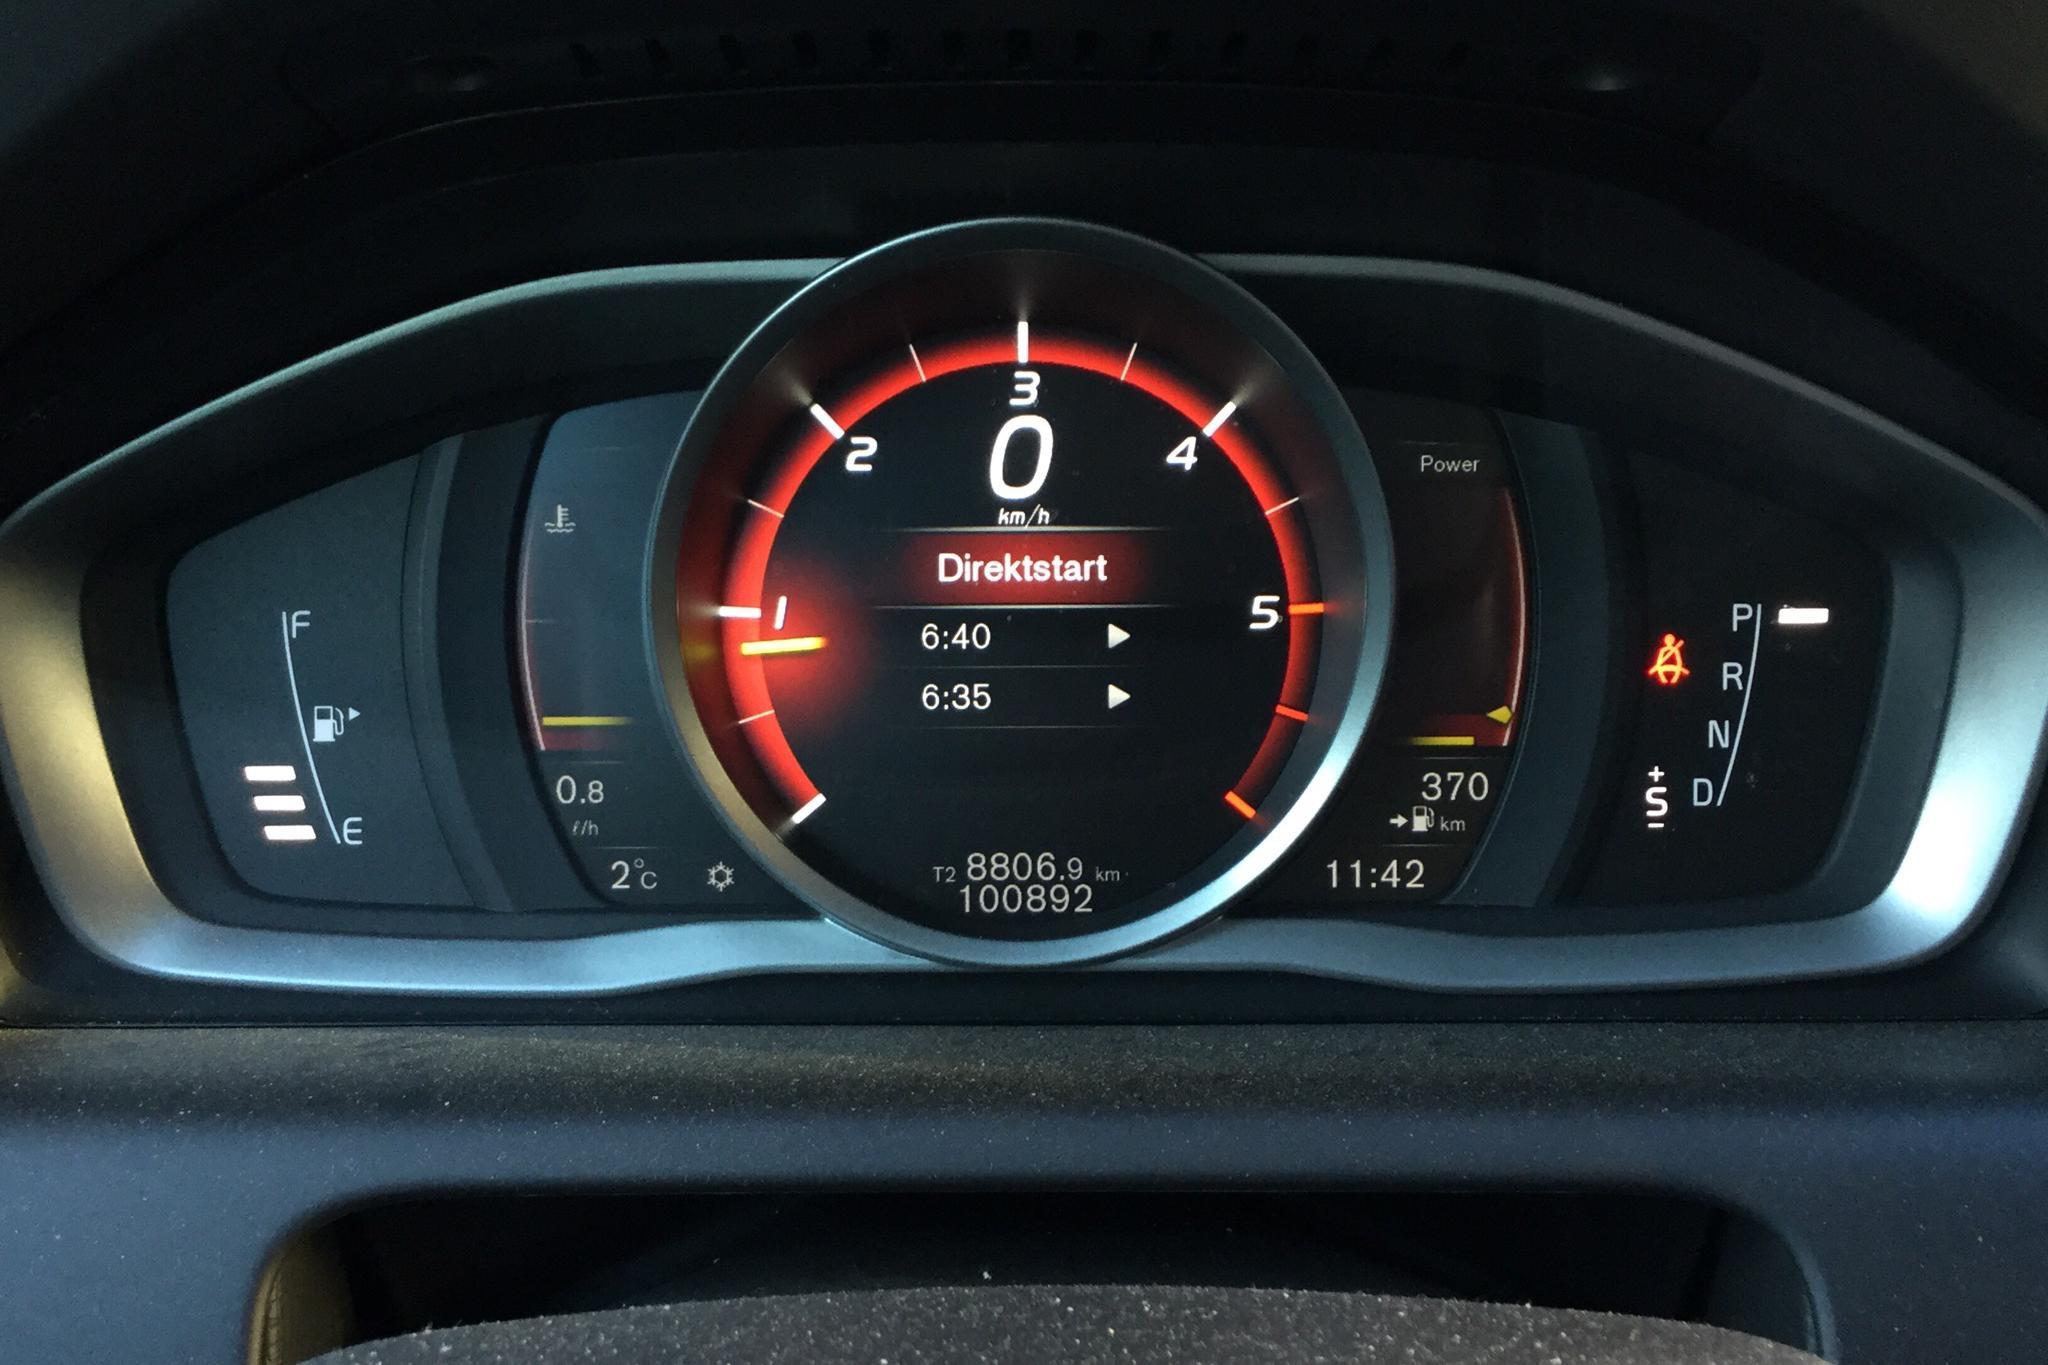 Volvo XC60 D3 2WD (150hk) - 100 890 km - Automatic - white - 2017